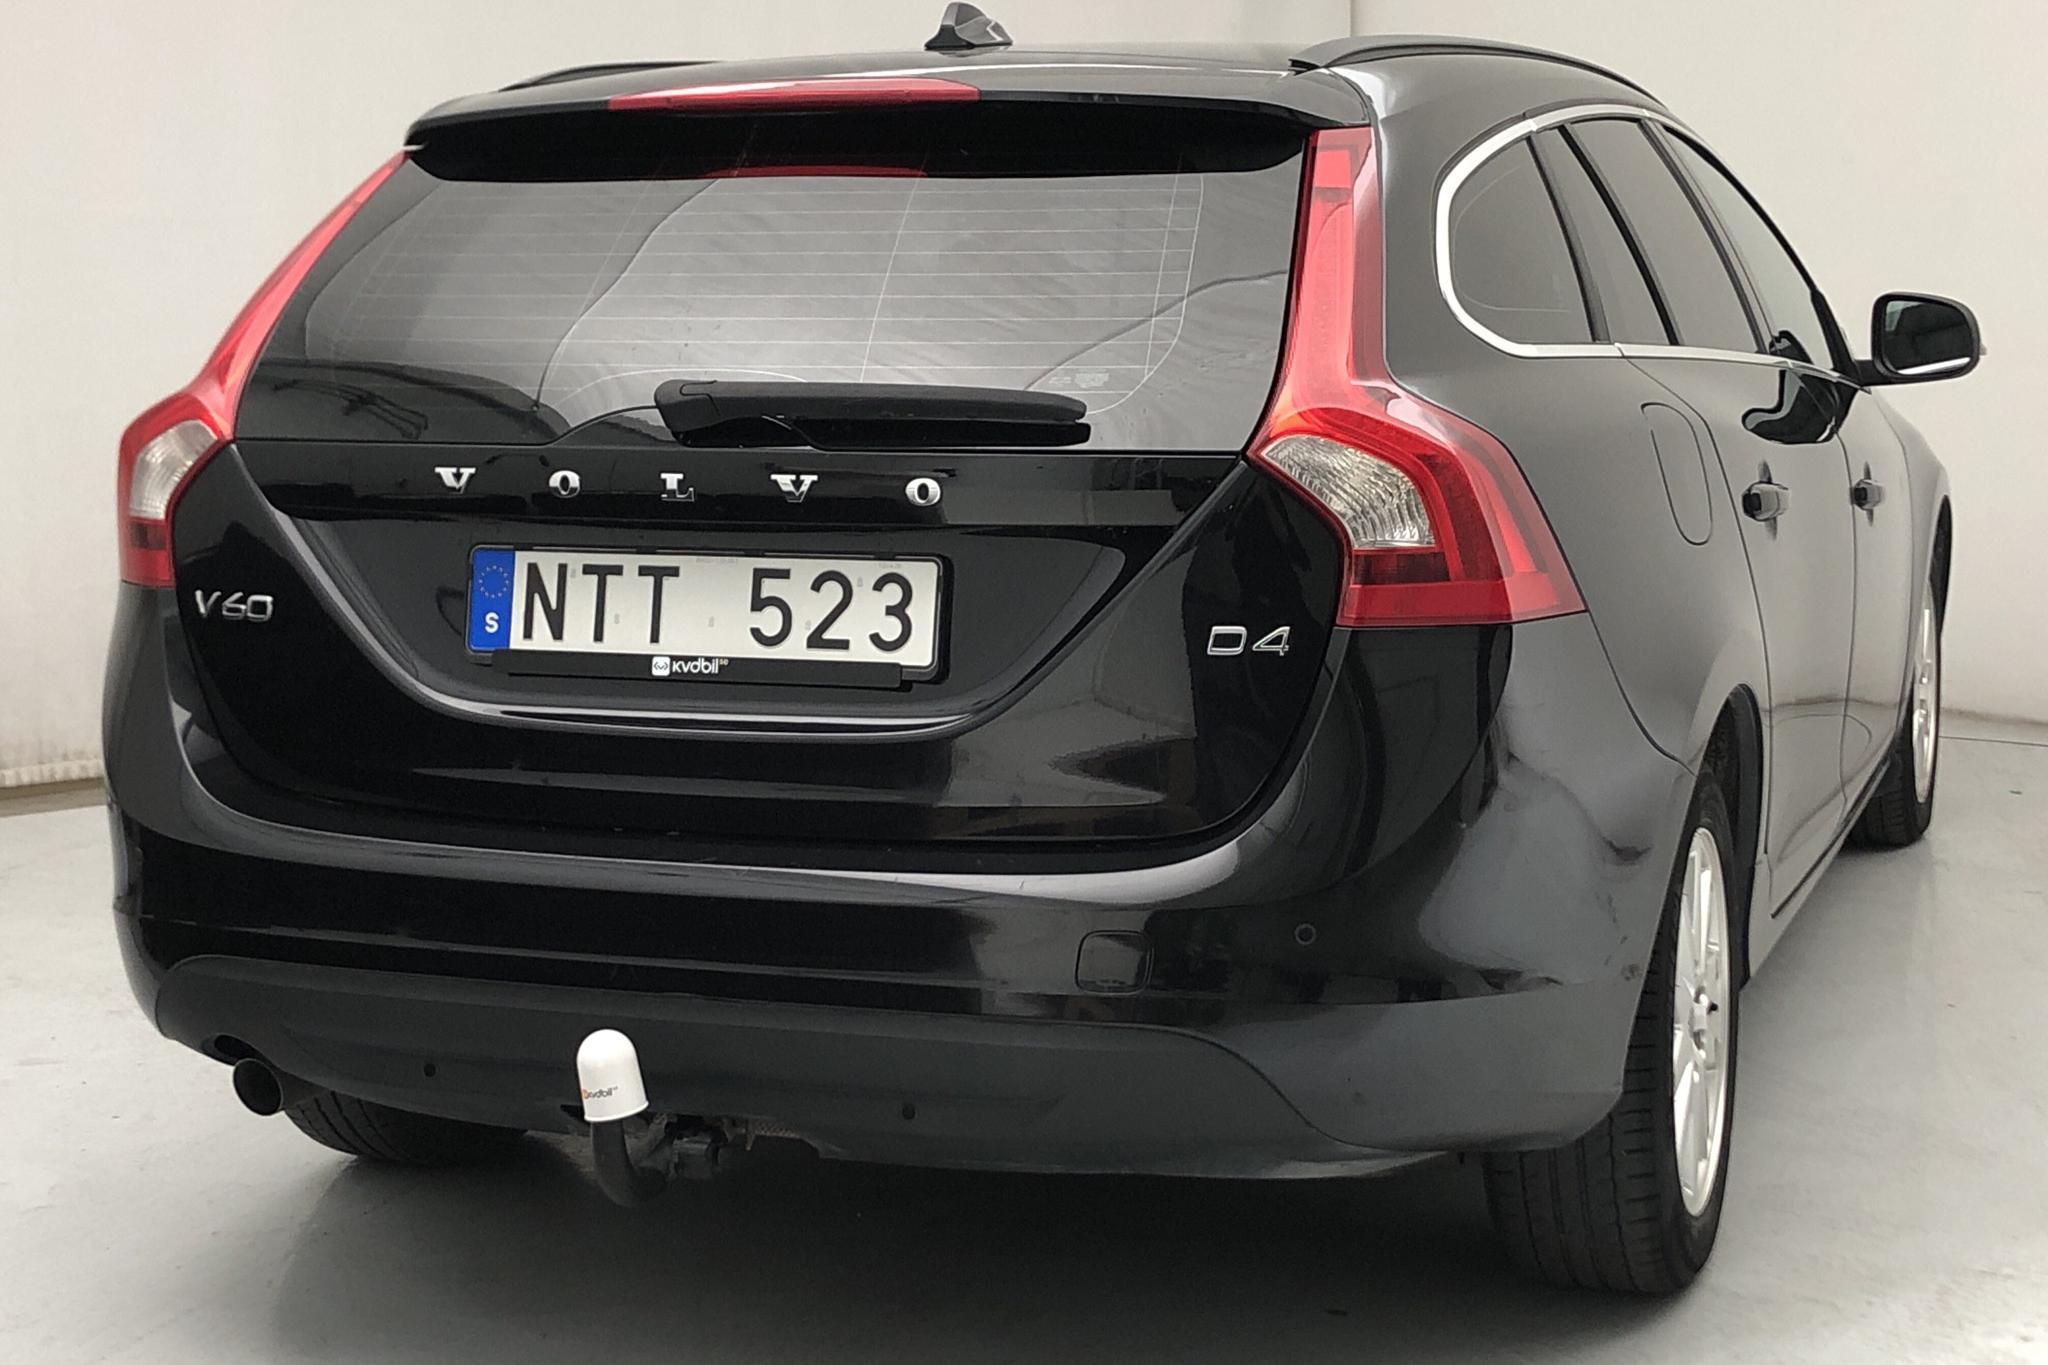 Volvo V60 D4 (163hk) - 275 910 km - Automatic - black - 2013